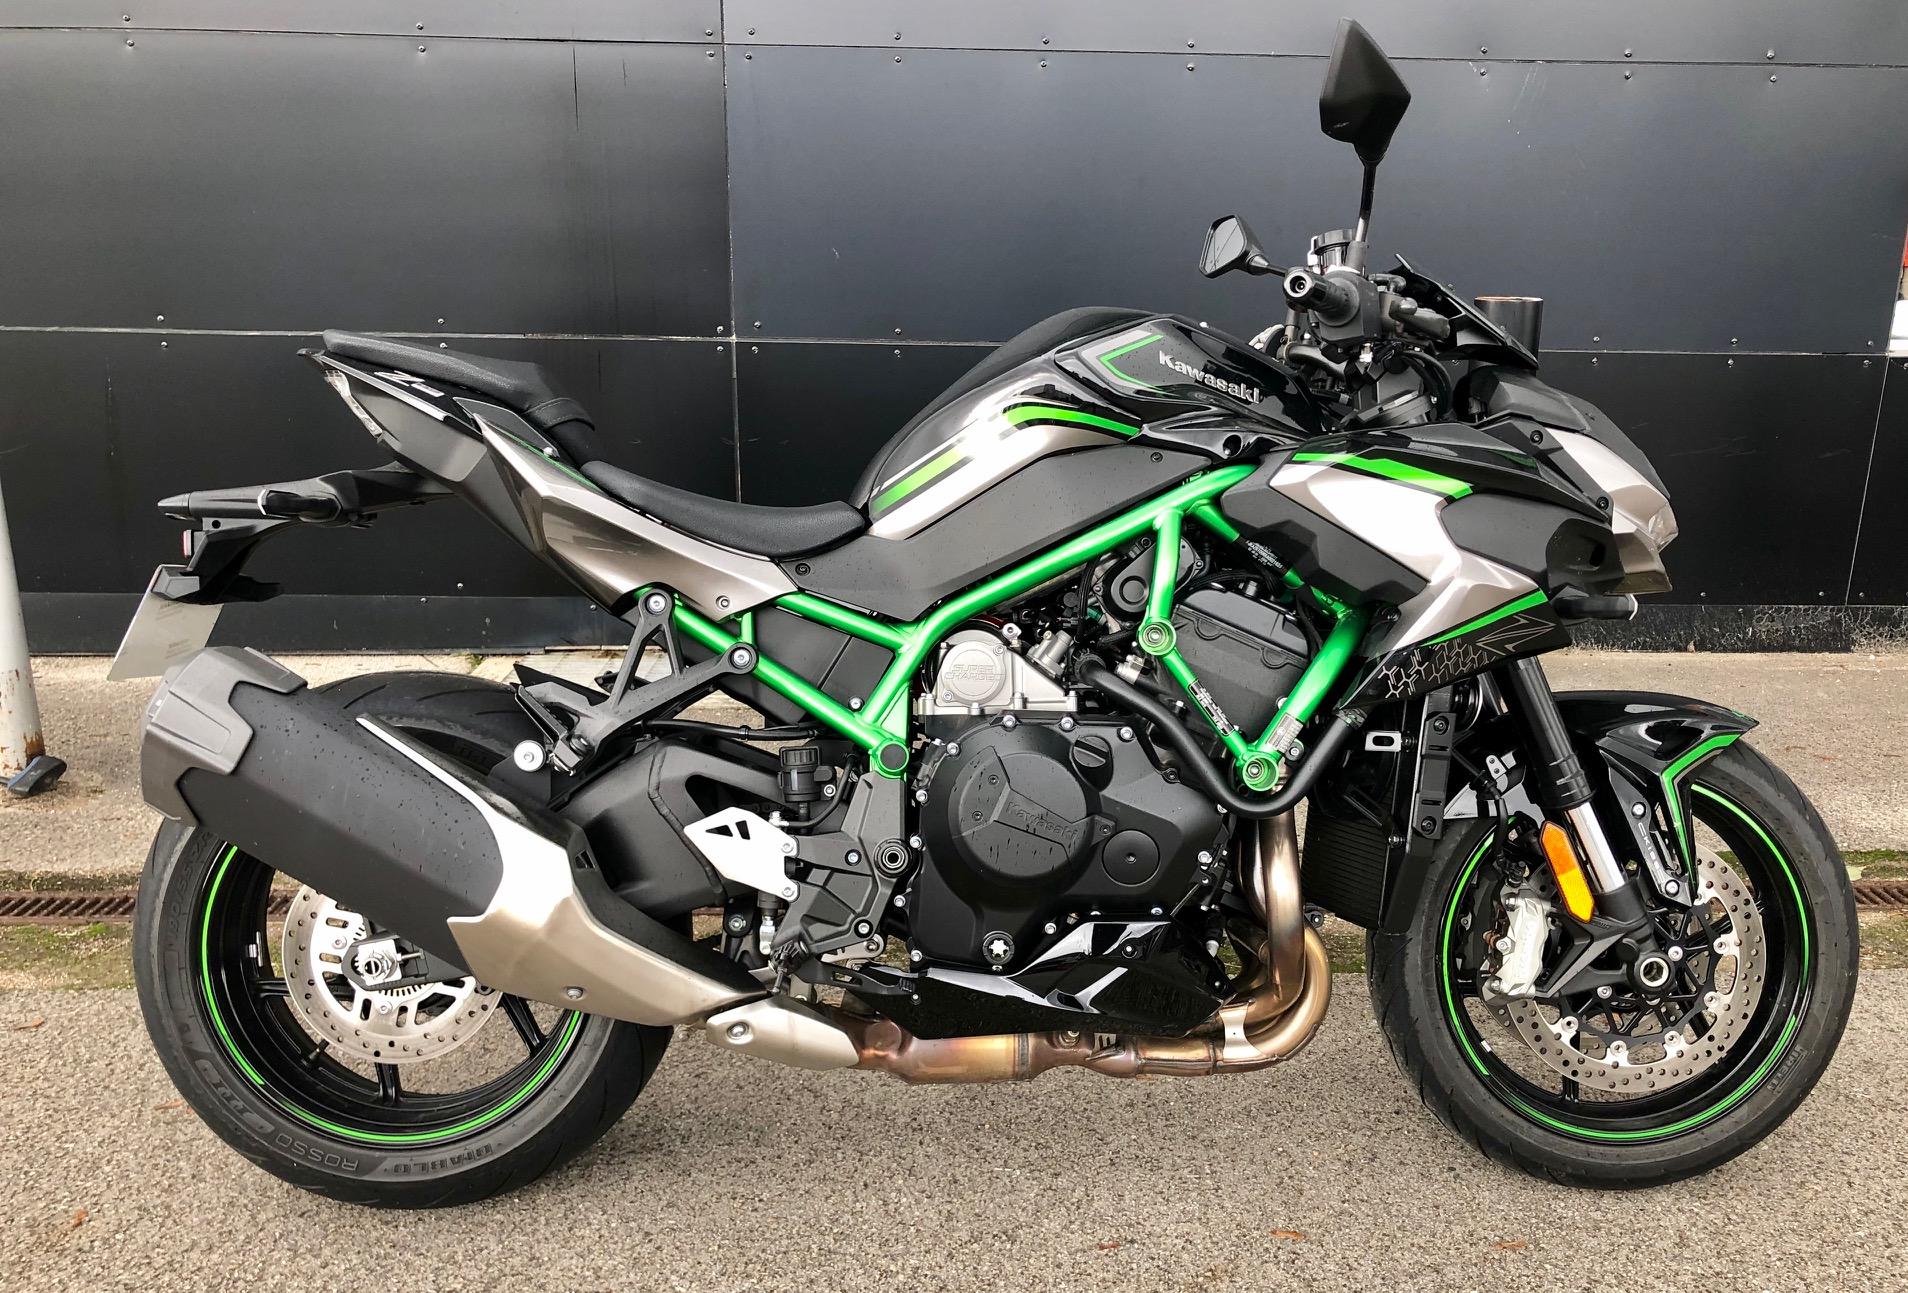 KAWASAKI ZH2 2020 998 cm3 | moto roadster | 1 390 km